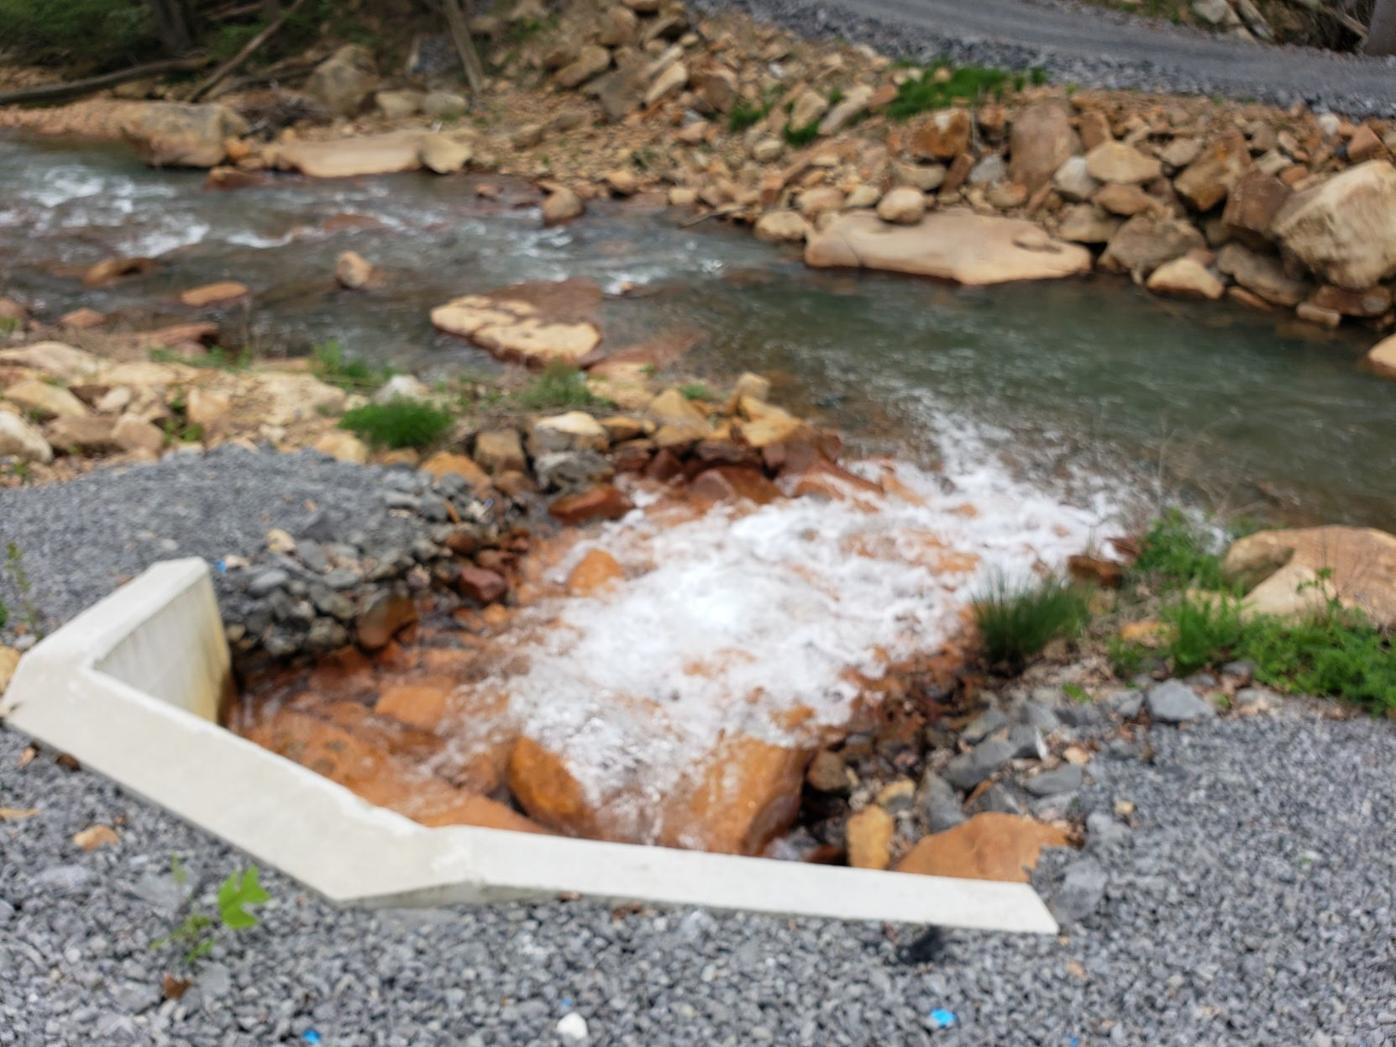 Treated water entering Muddy Creek